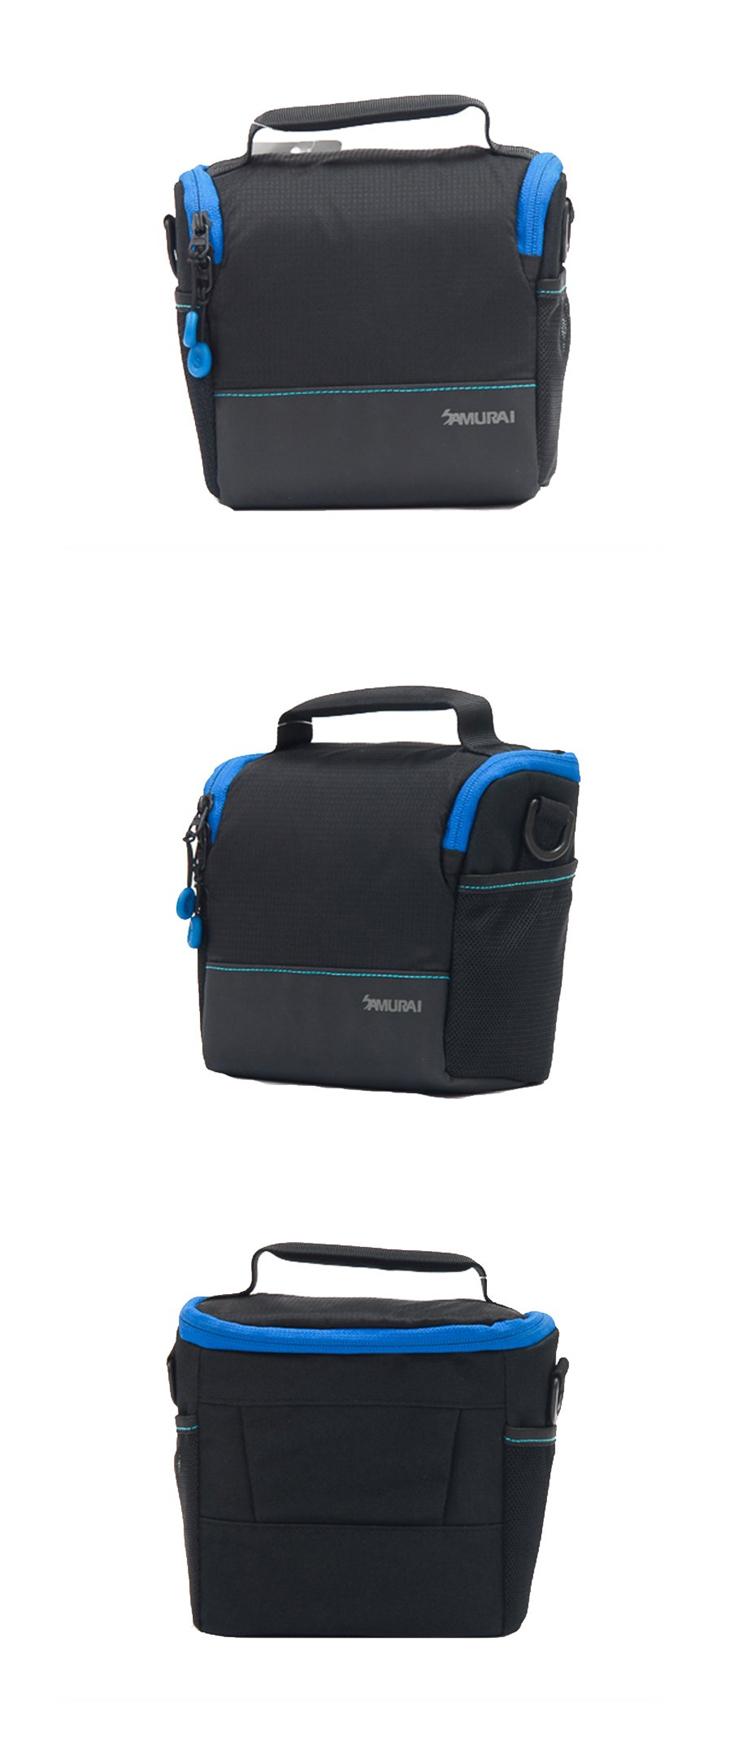 『e電匠倉』SAMURAI 新武士 S-CAM 01M 輕便旅遊手提相機包 一機二鏡 相機包 攝影收納袋 便攜包 攝影包